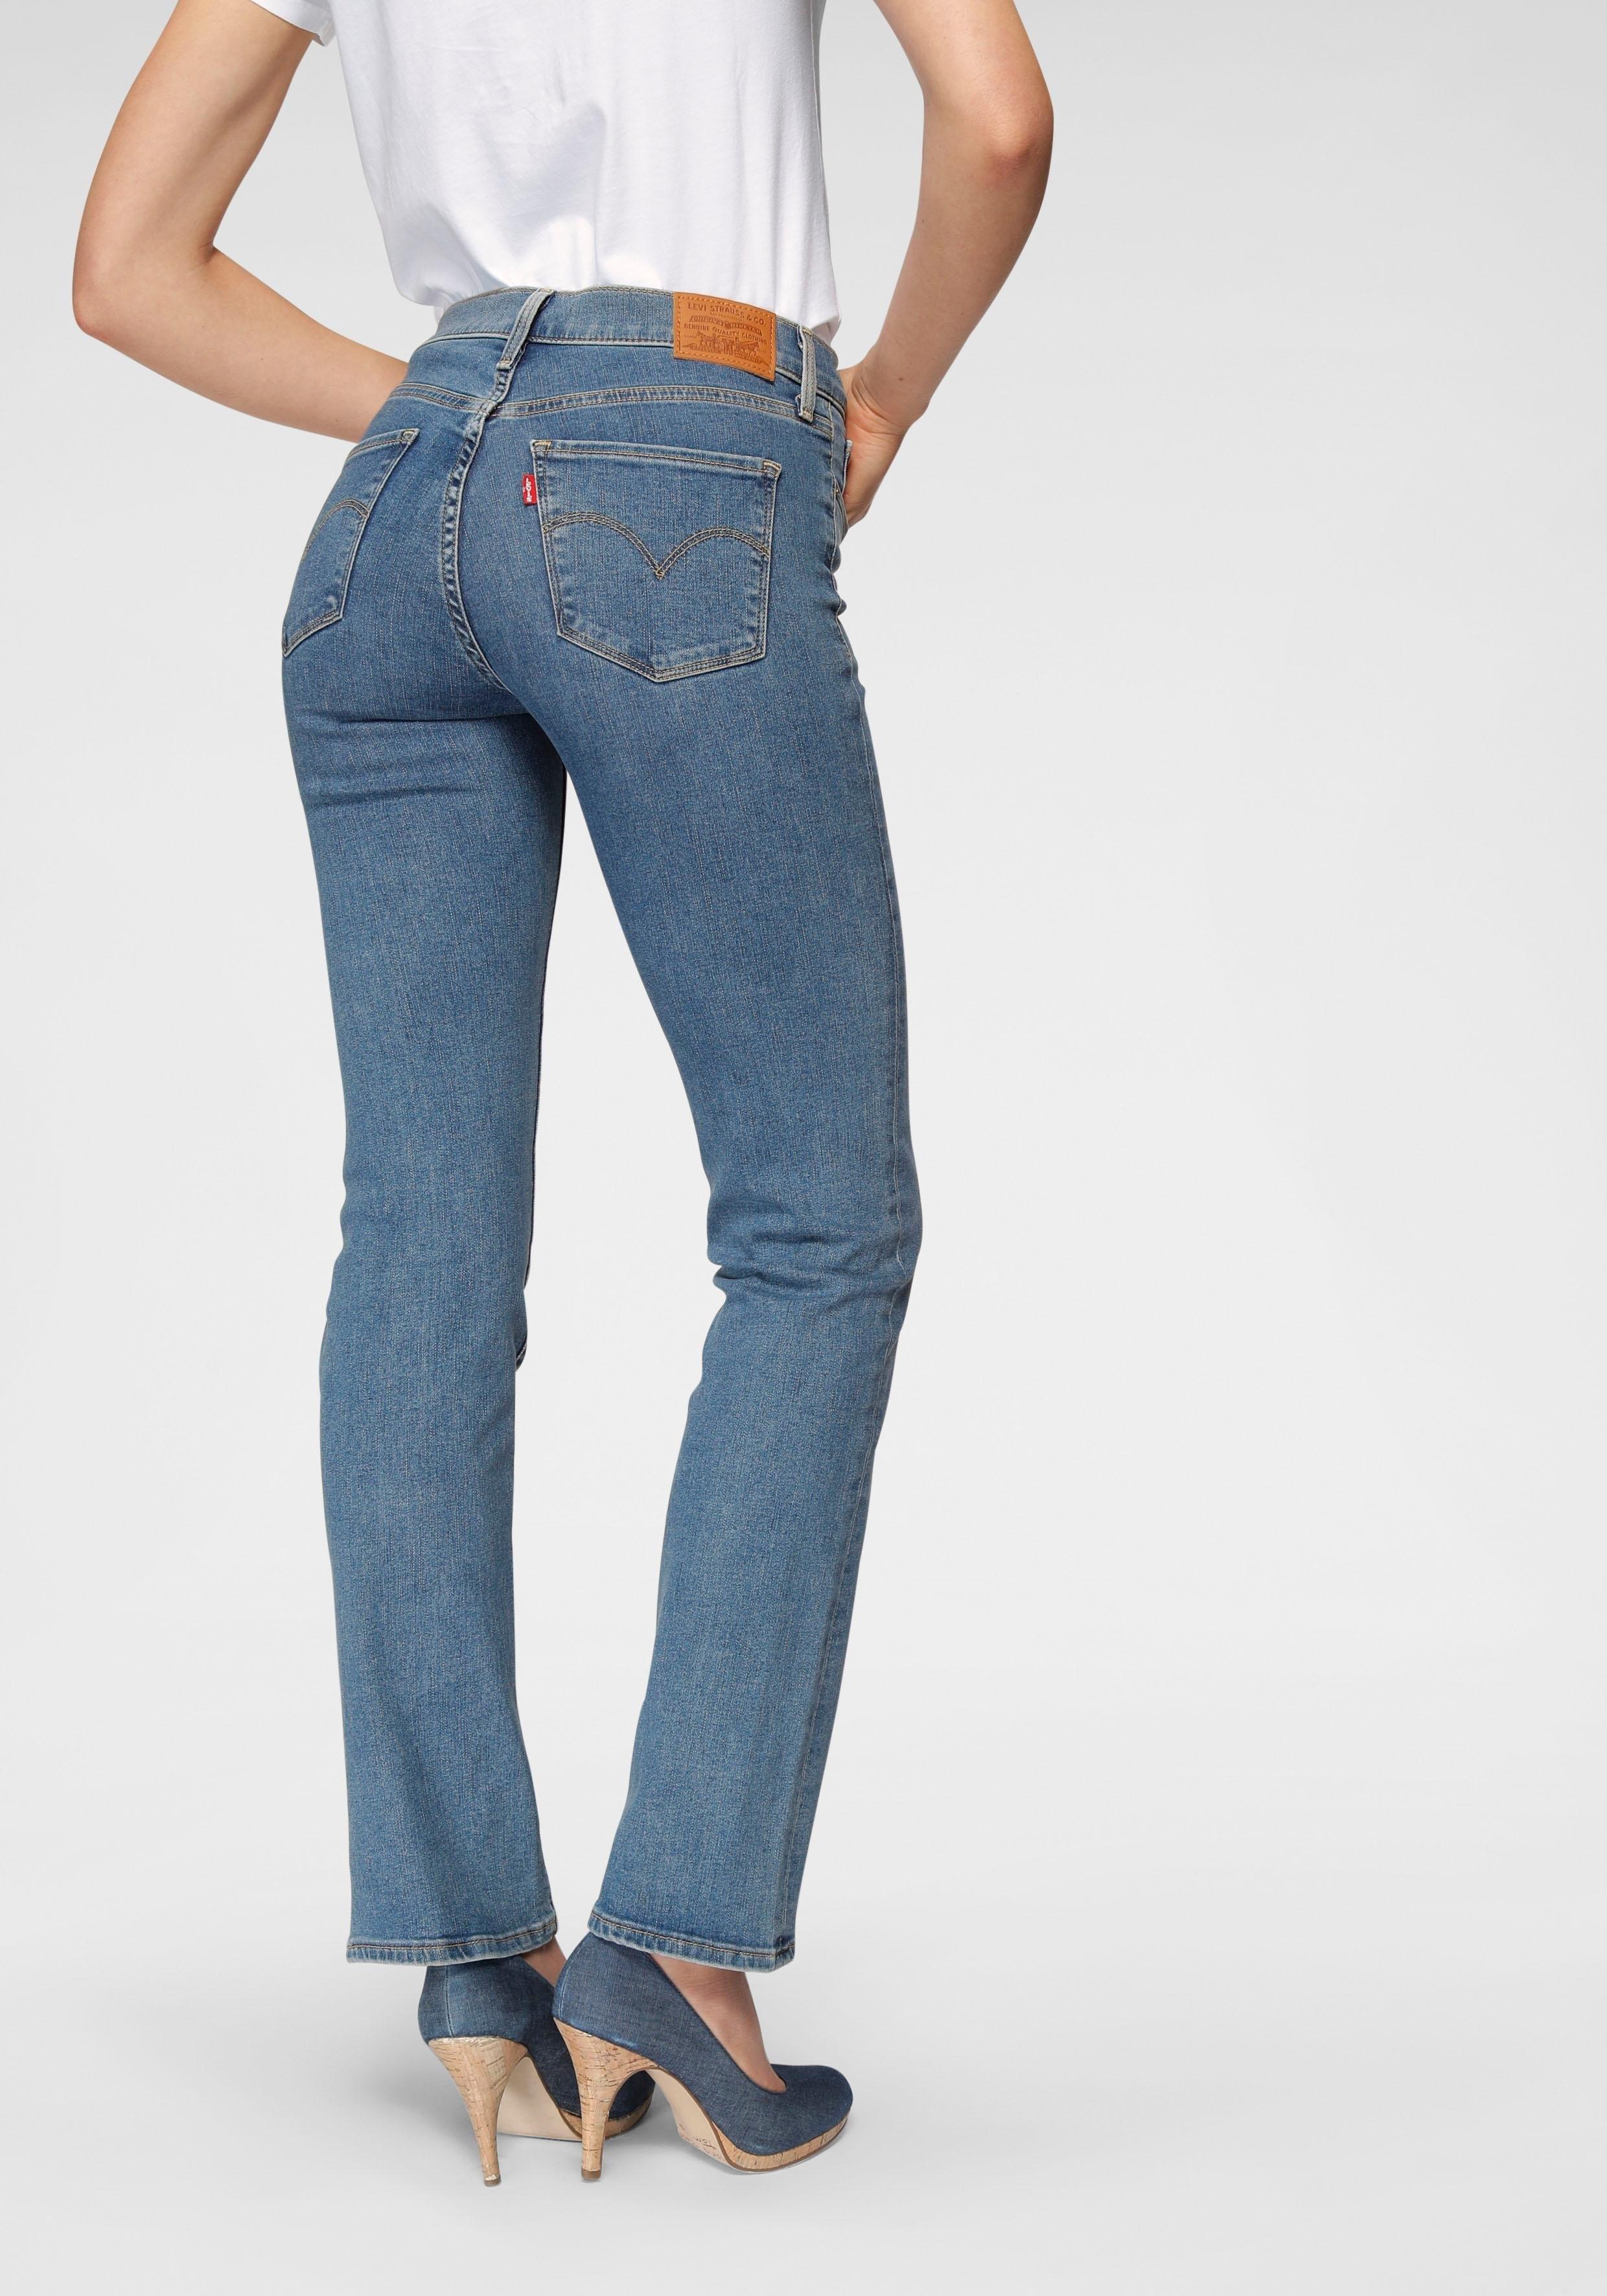 Levi's Rechte jeans 314 Shaping Straight goedkoop op otto.nl kopen